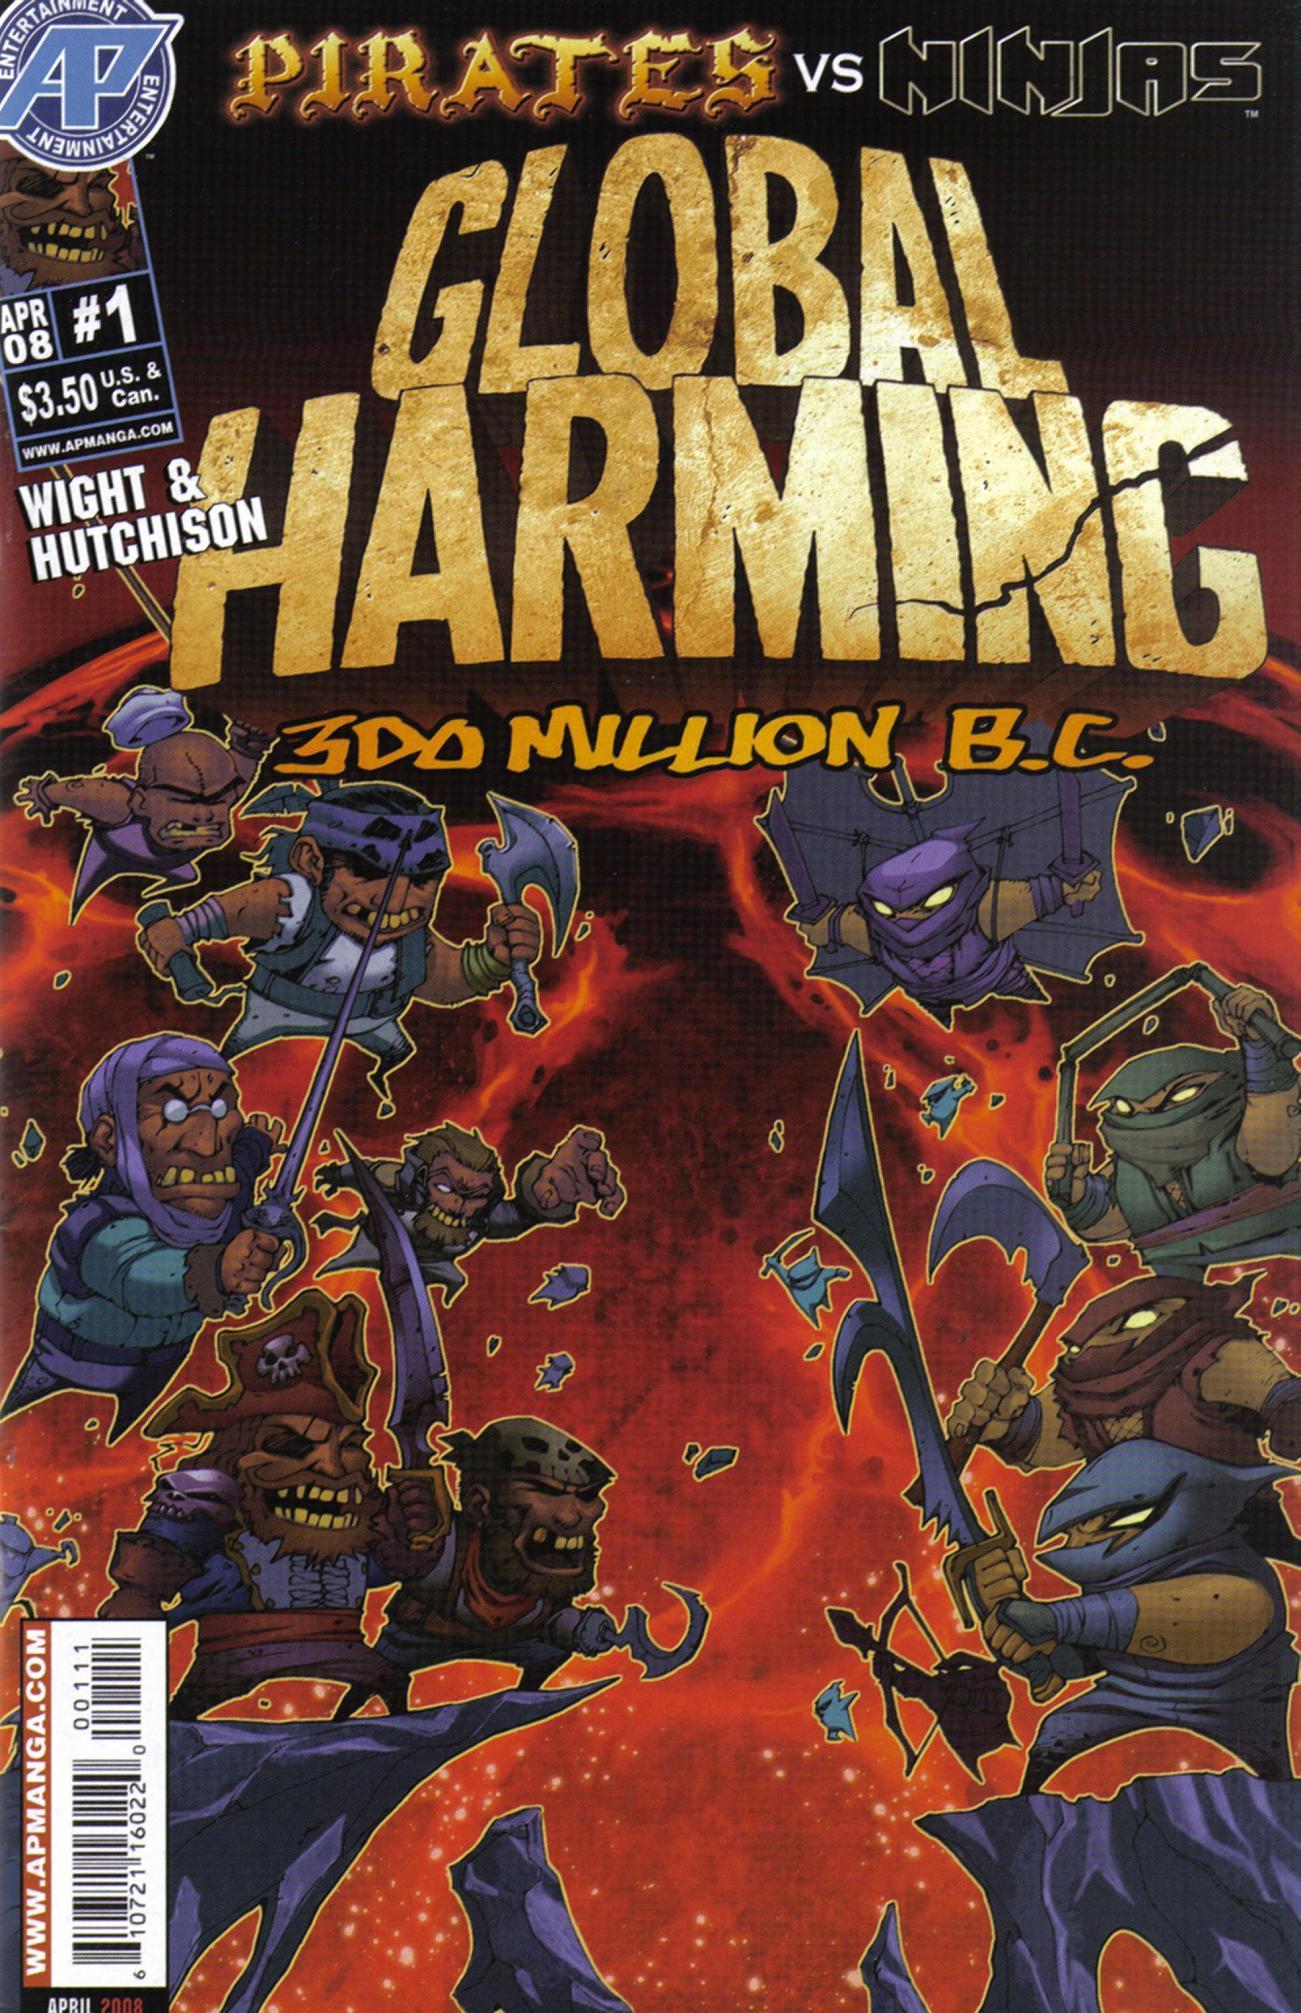 Read online Pirates vs. Ninjas: Global Harming comic -  Issue # Full - 1